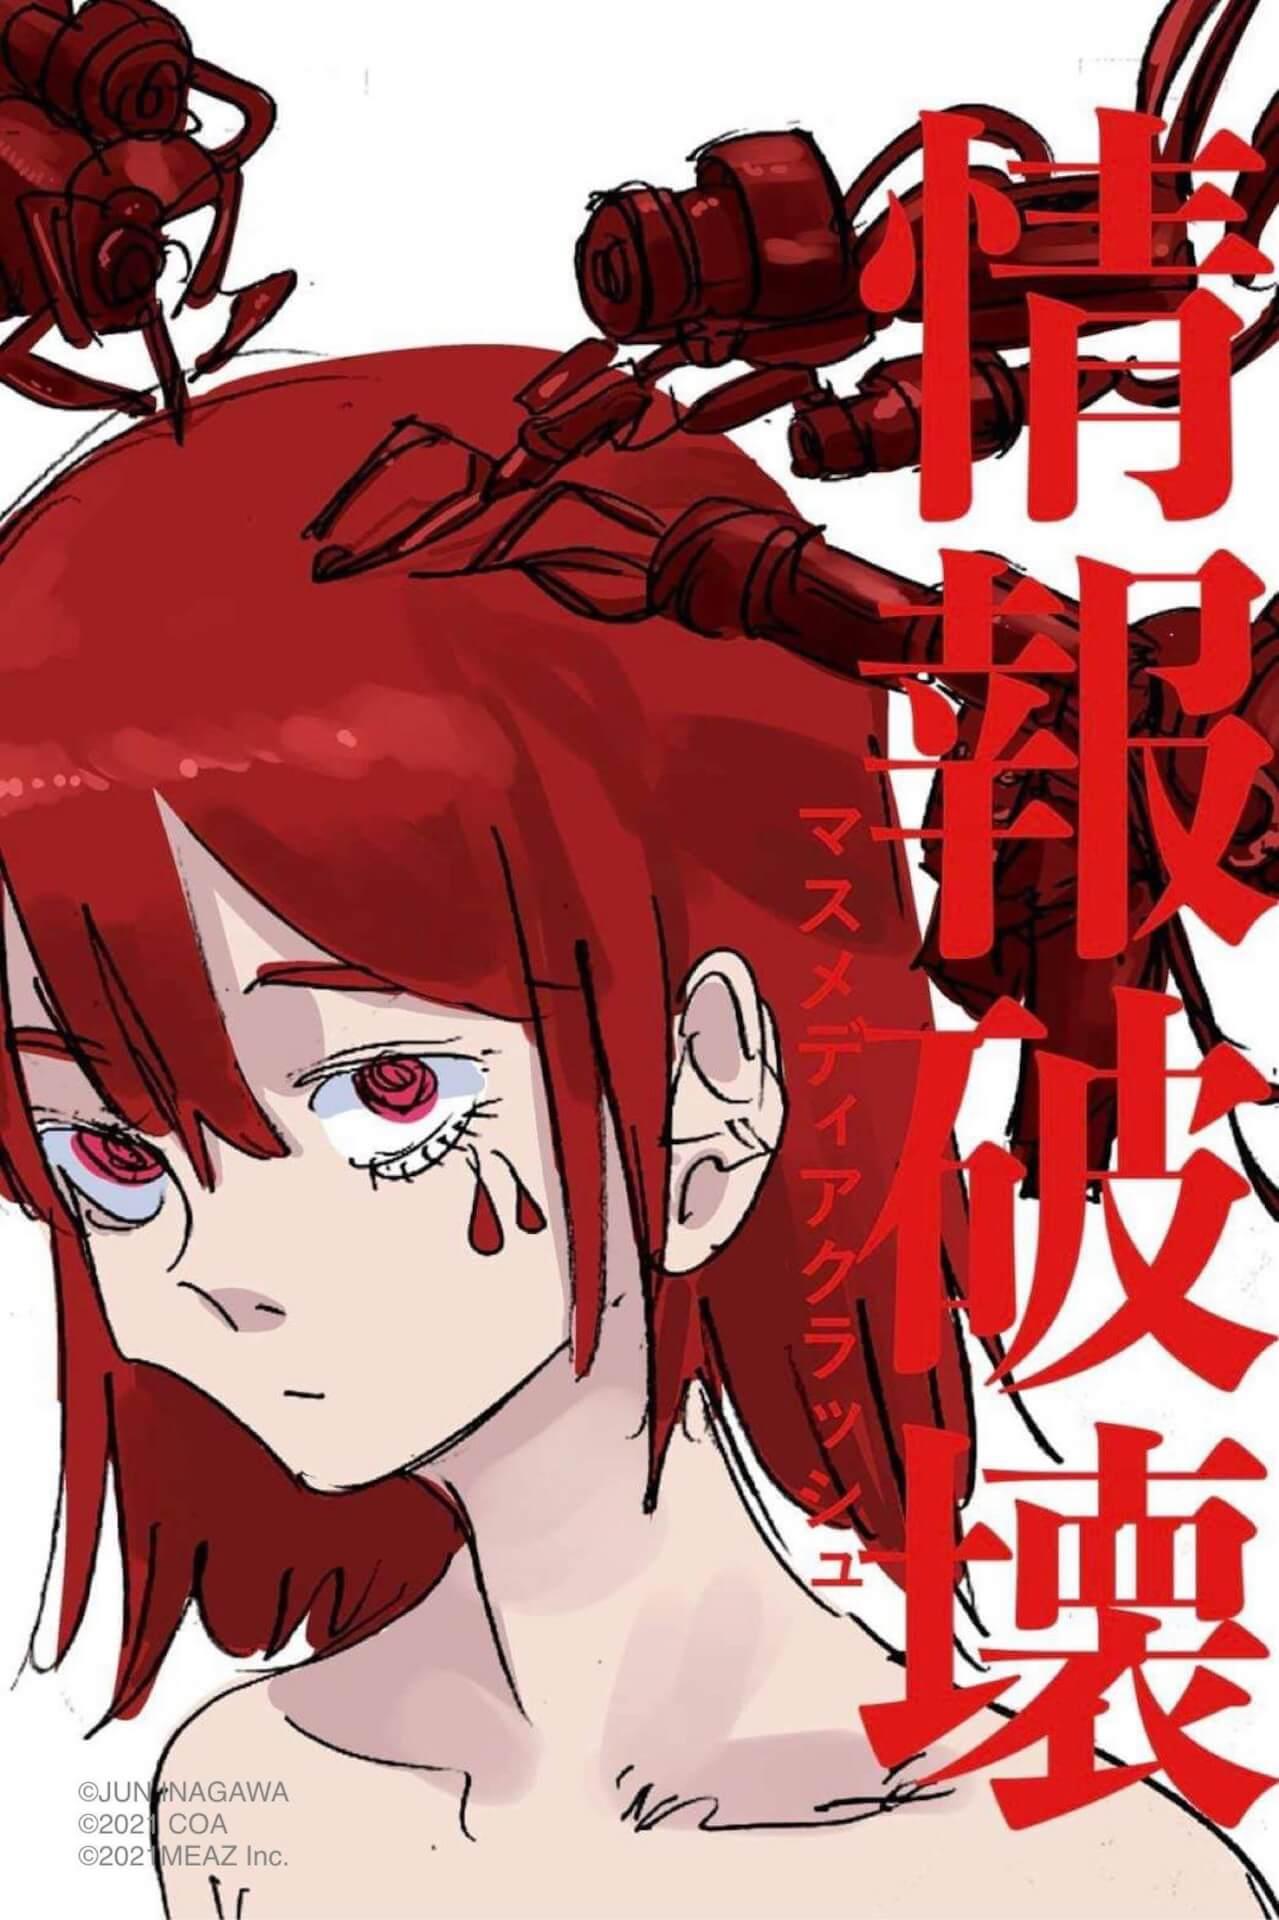 JUN INAGAWAの初作品集『情報破壊 マスメディアクラッシュ』がSHIBUYA TSUTAYAにて発売決定! art210423_juninagawa-210423_2